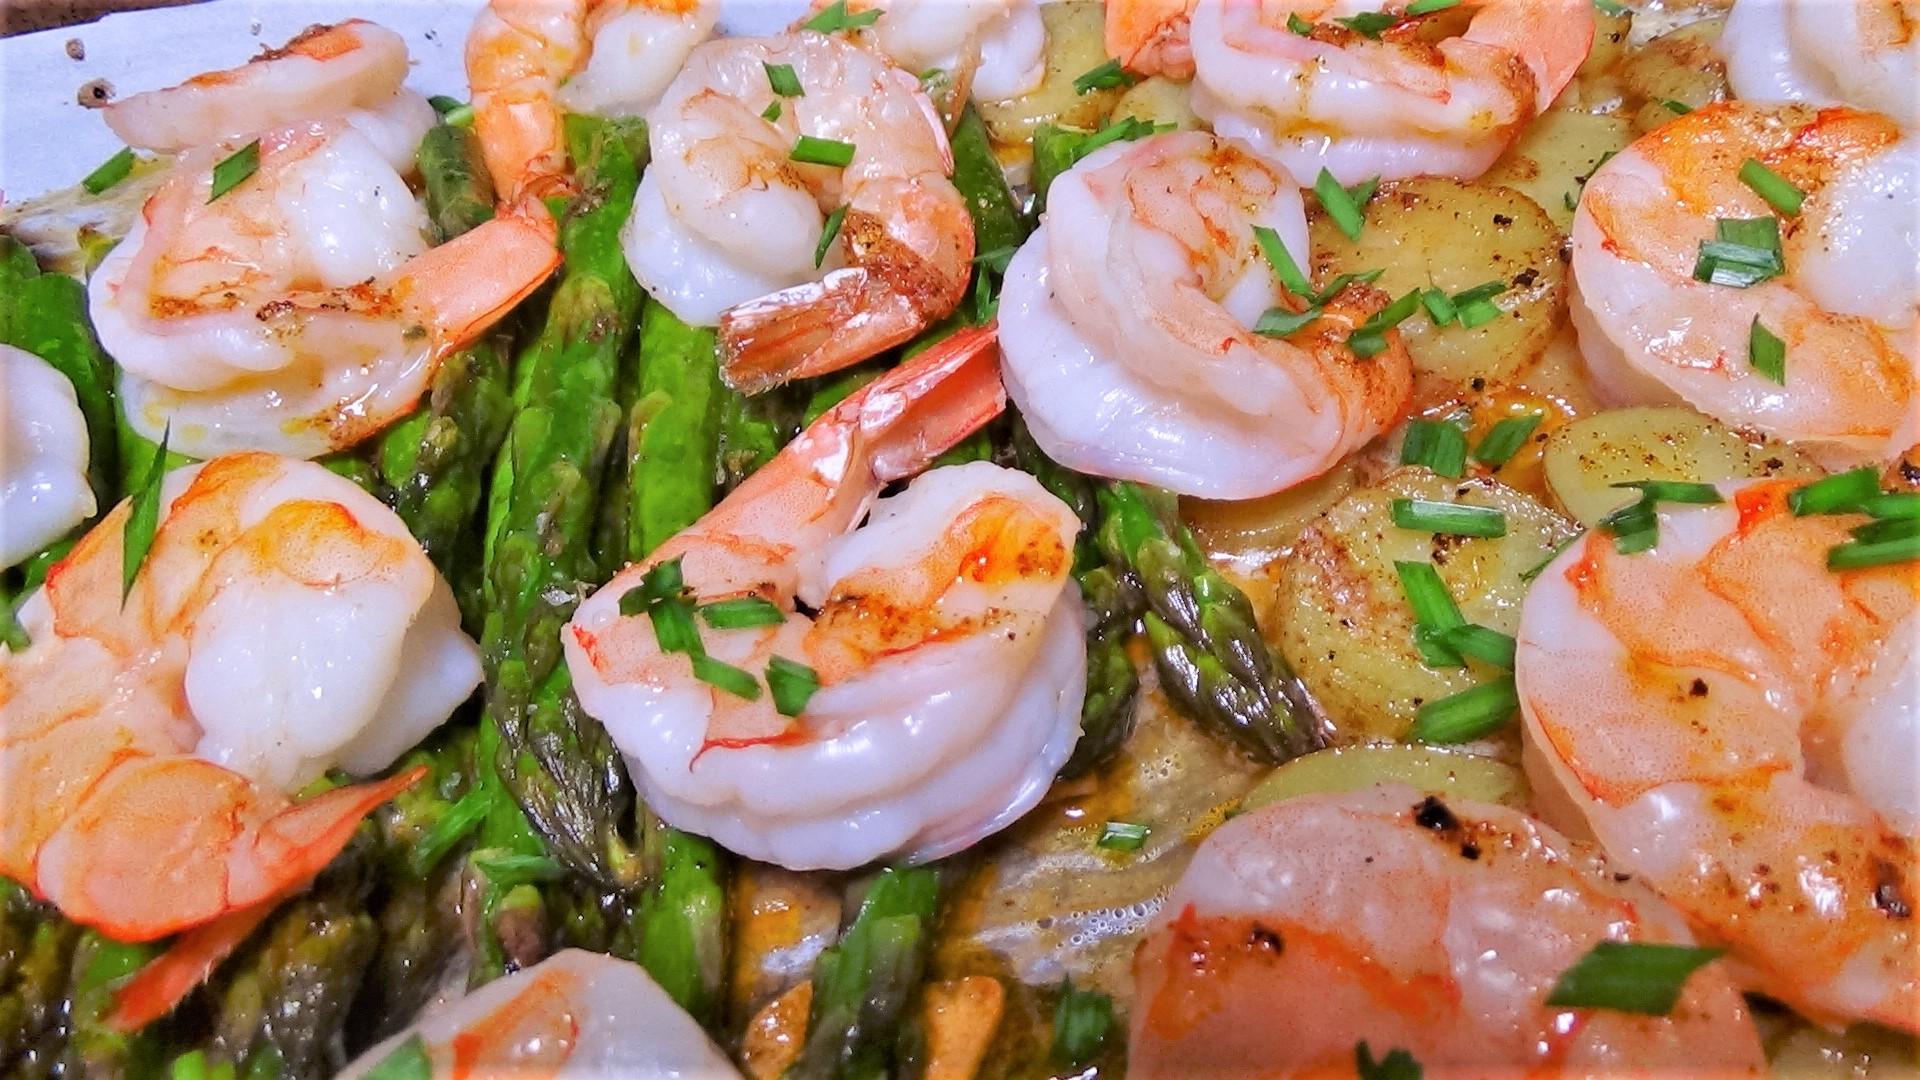 Sheet Pan Shrimp, Asparagus and Fingerling Potatoes